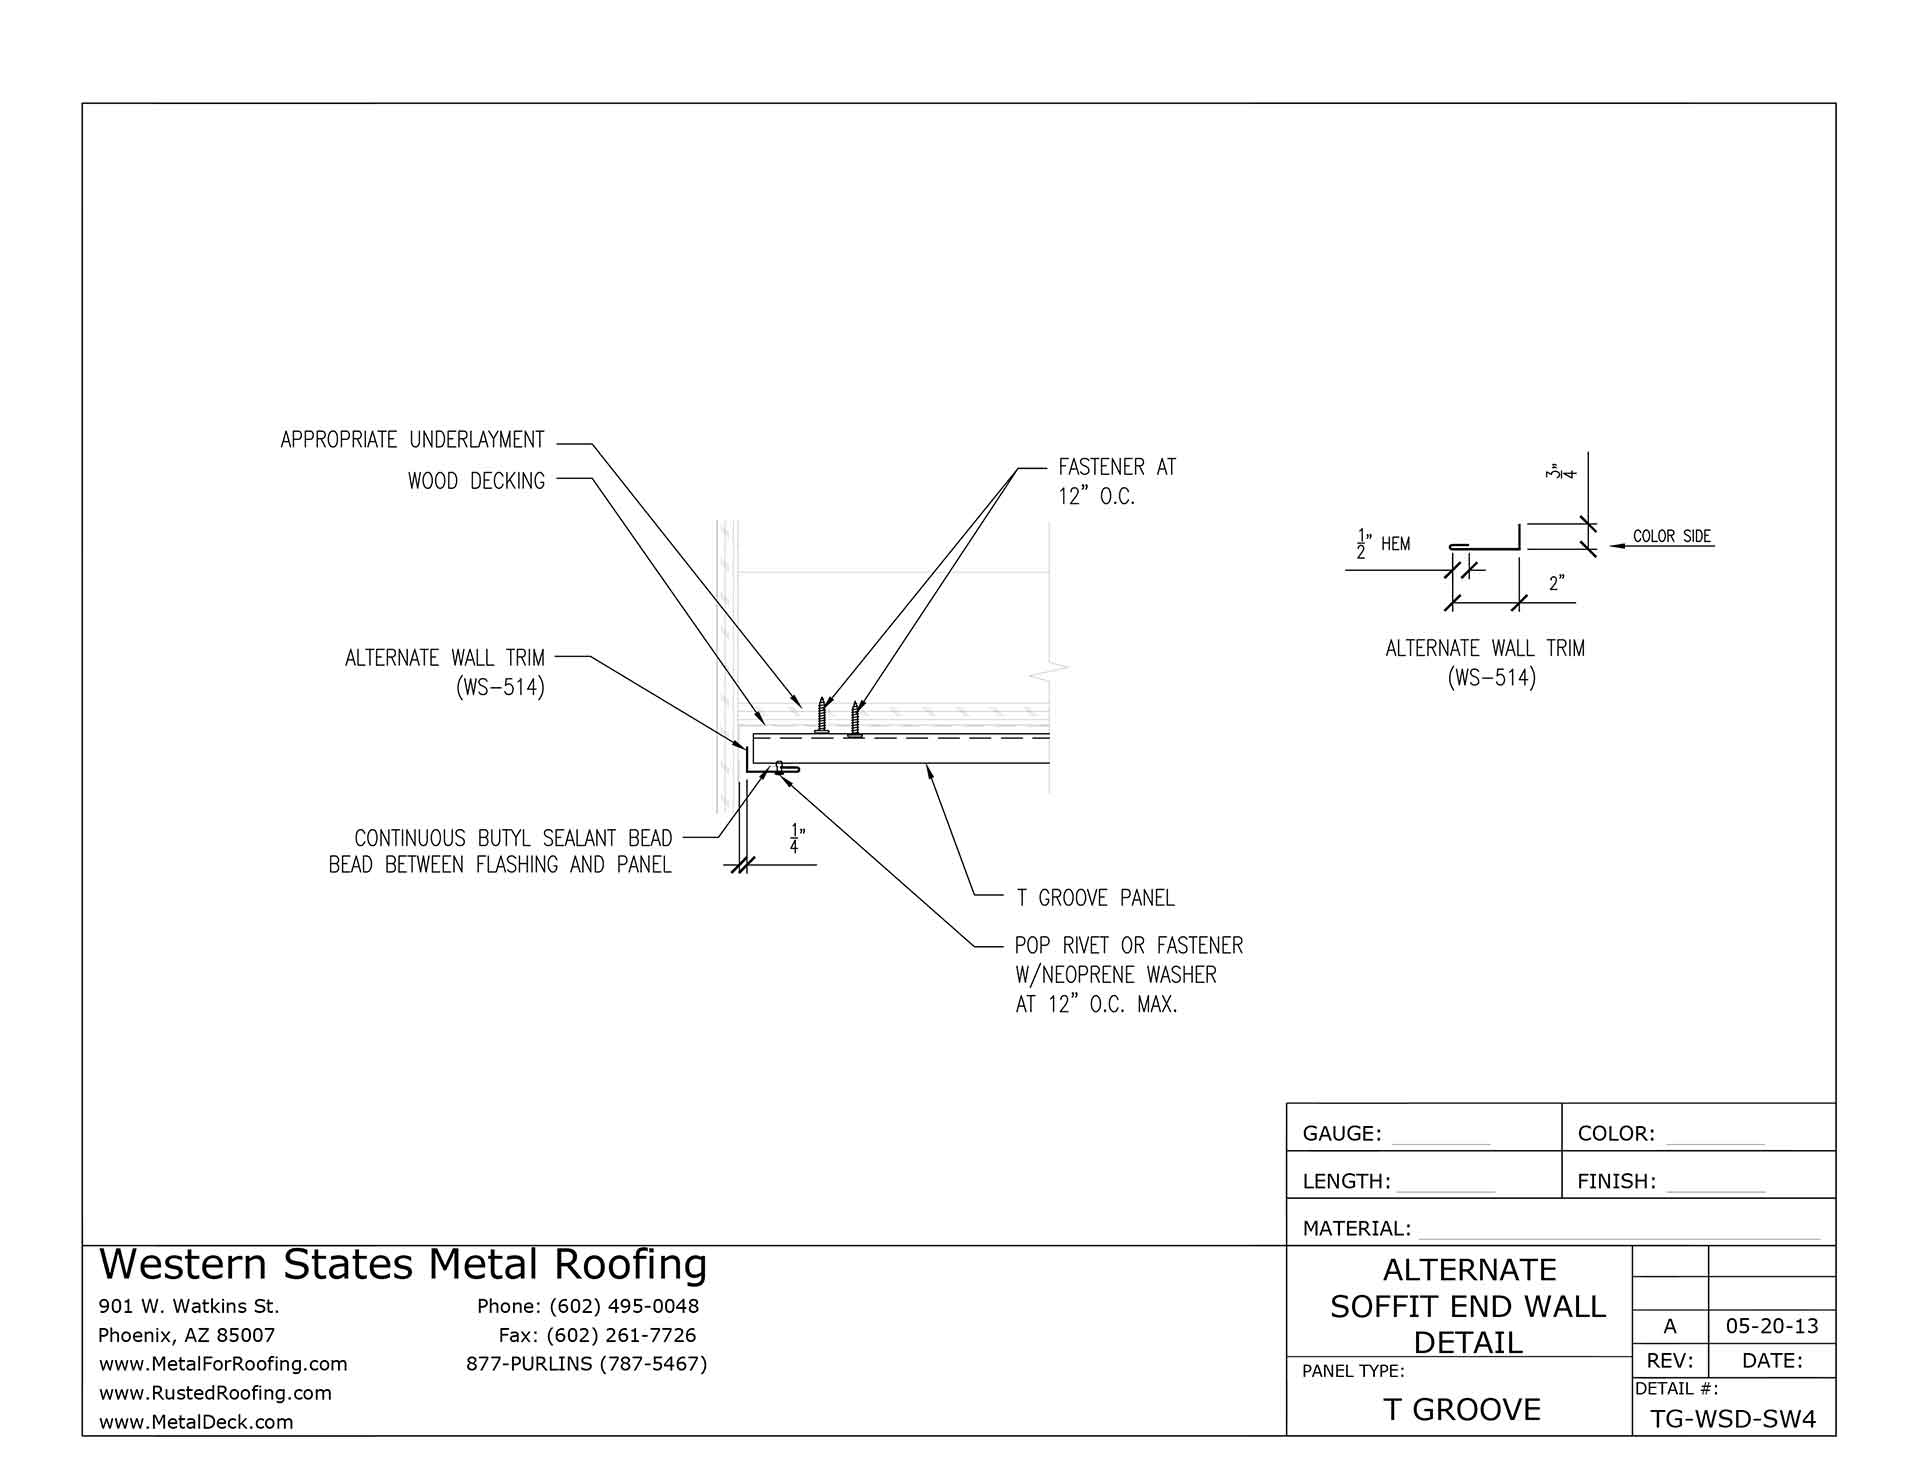 https://f.hubspotusercontent30.net/hubfs/6069238/images/trim-flashings/t-groove/tg-wsd-sw4-alternate-soffite-end-wall-detail.jpg